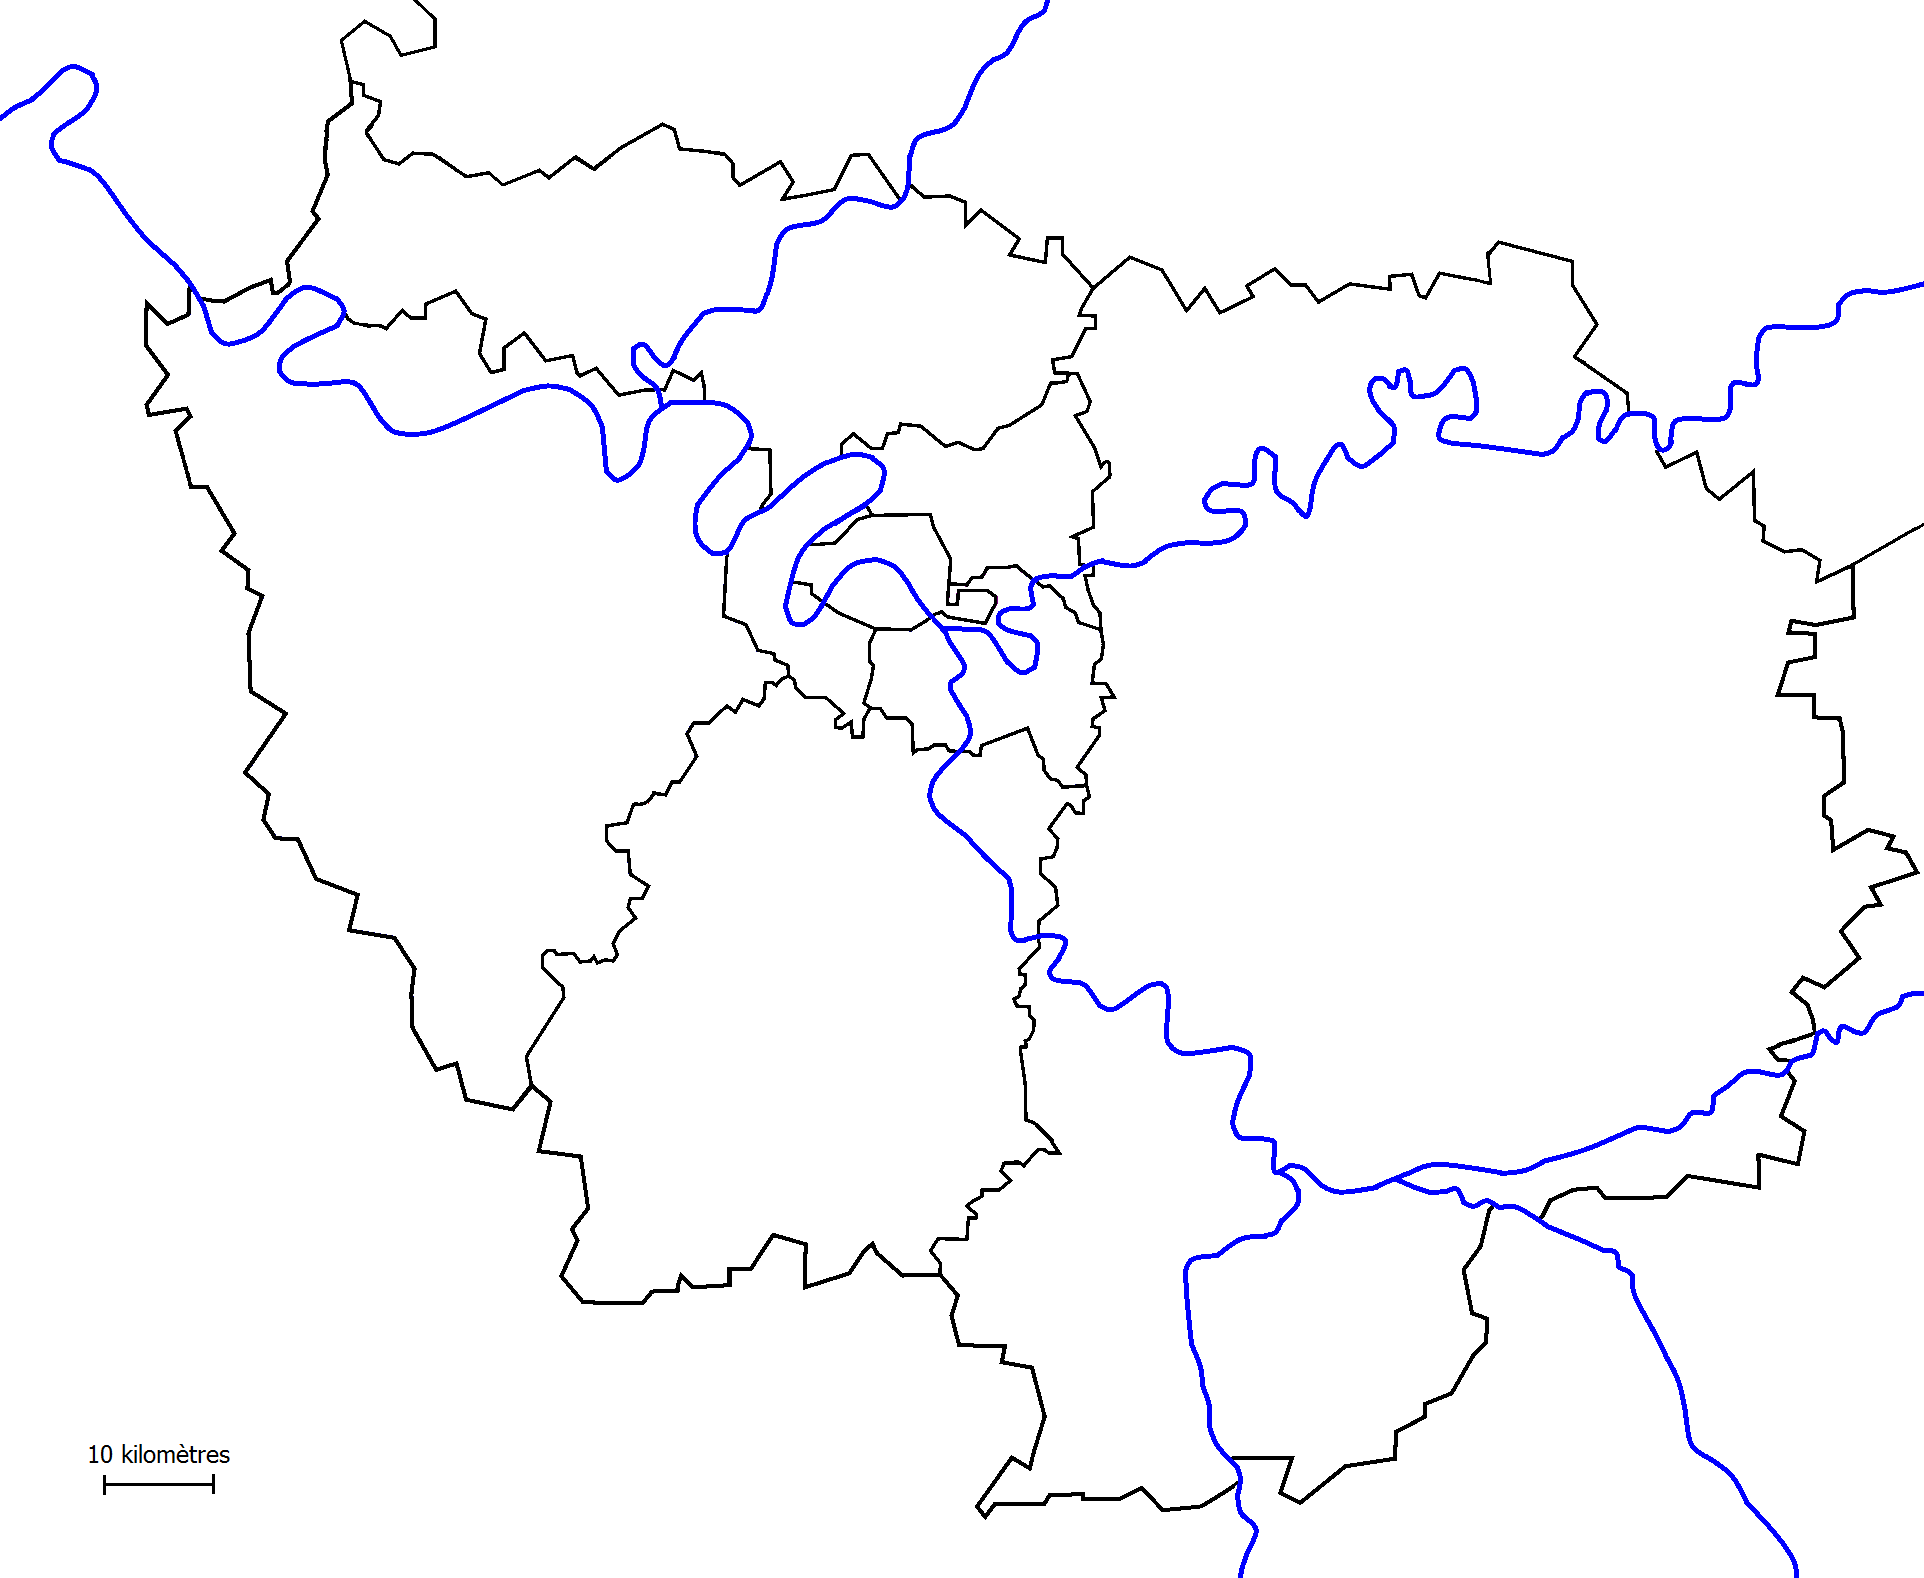 fond de carte de france File:Île de France (fond de carte).png   Wikimedia Commons